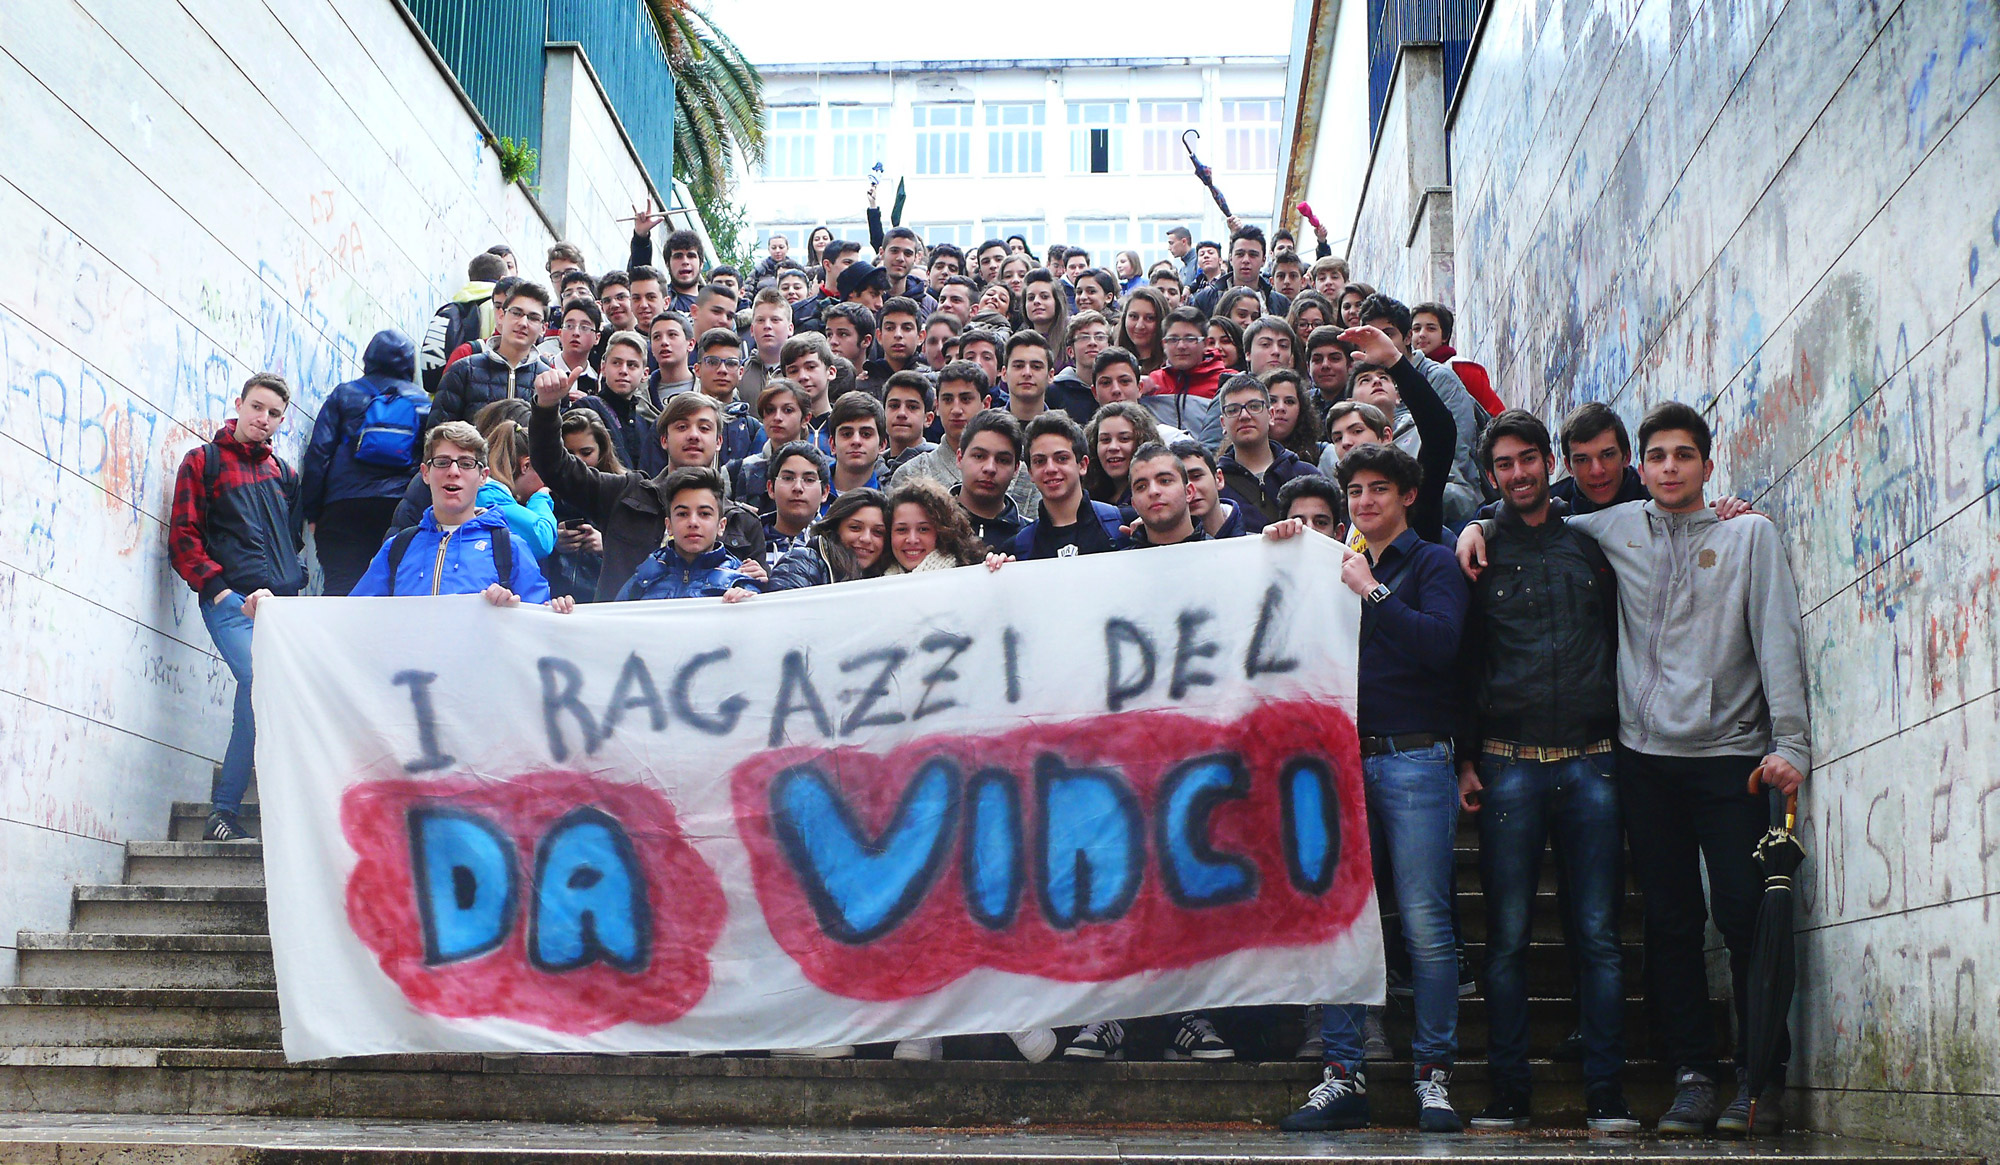 RagazziDaVinci2012